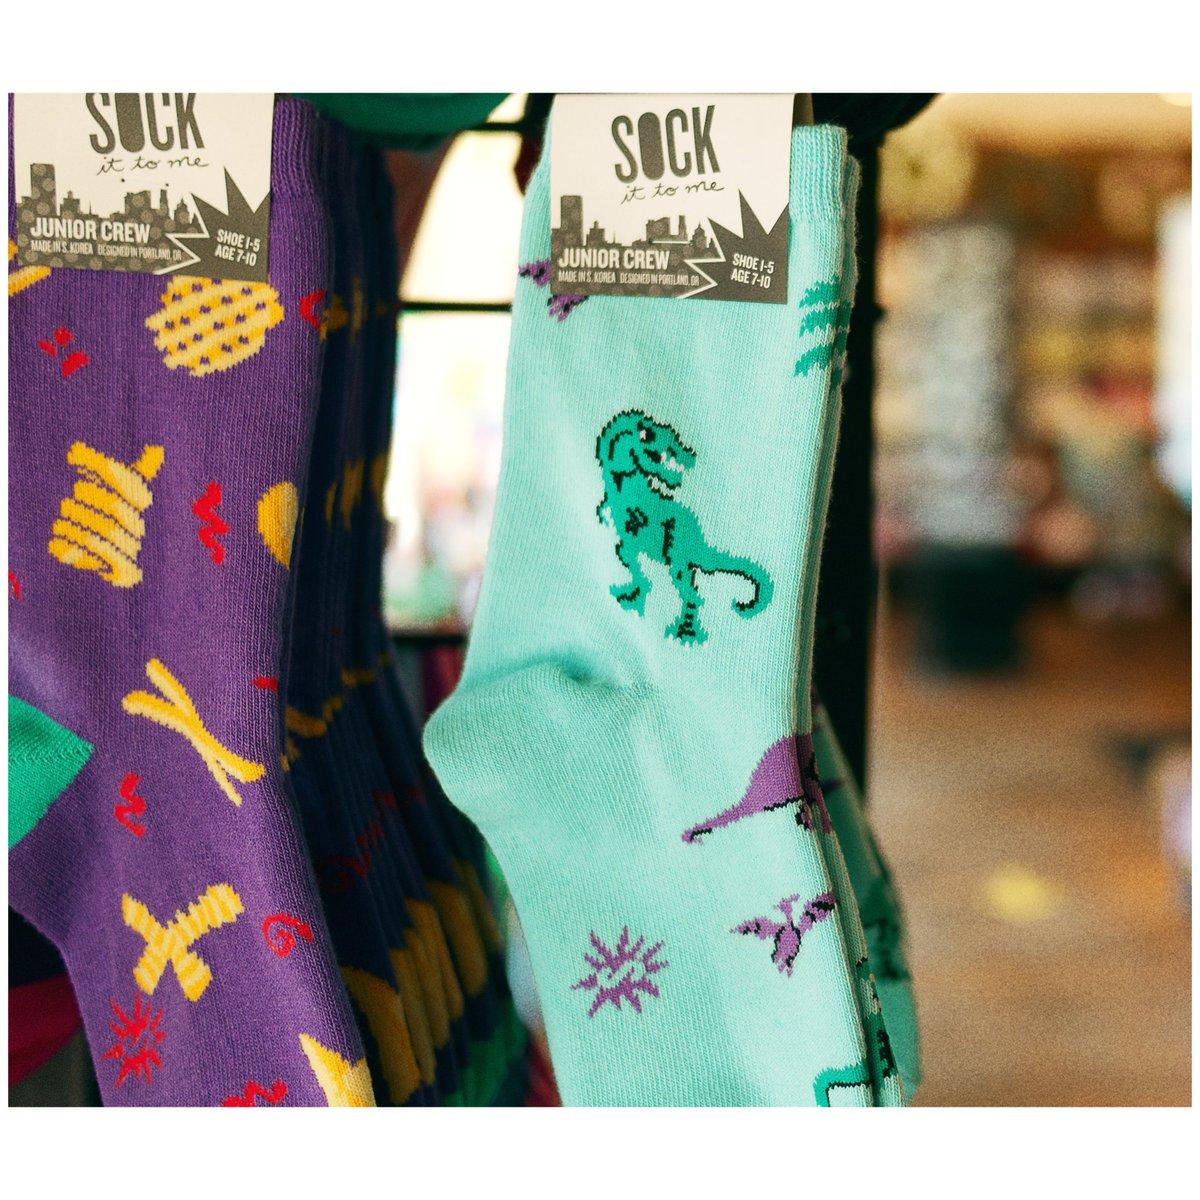 Assert your dominance with dino socks.  #kc #kcmo #kansascity #brooksidekc #shoplocalkc #bkskc #smallbusinesskc https://t.co/o2jt4HG5UP